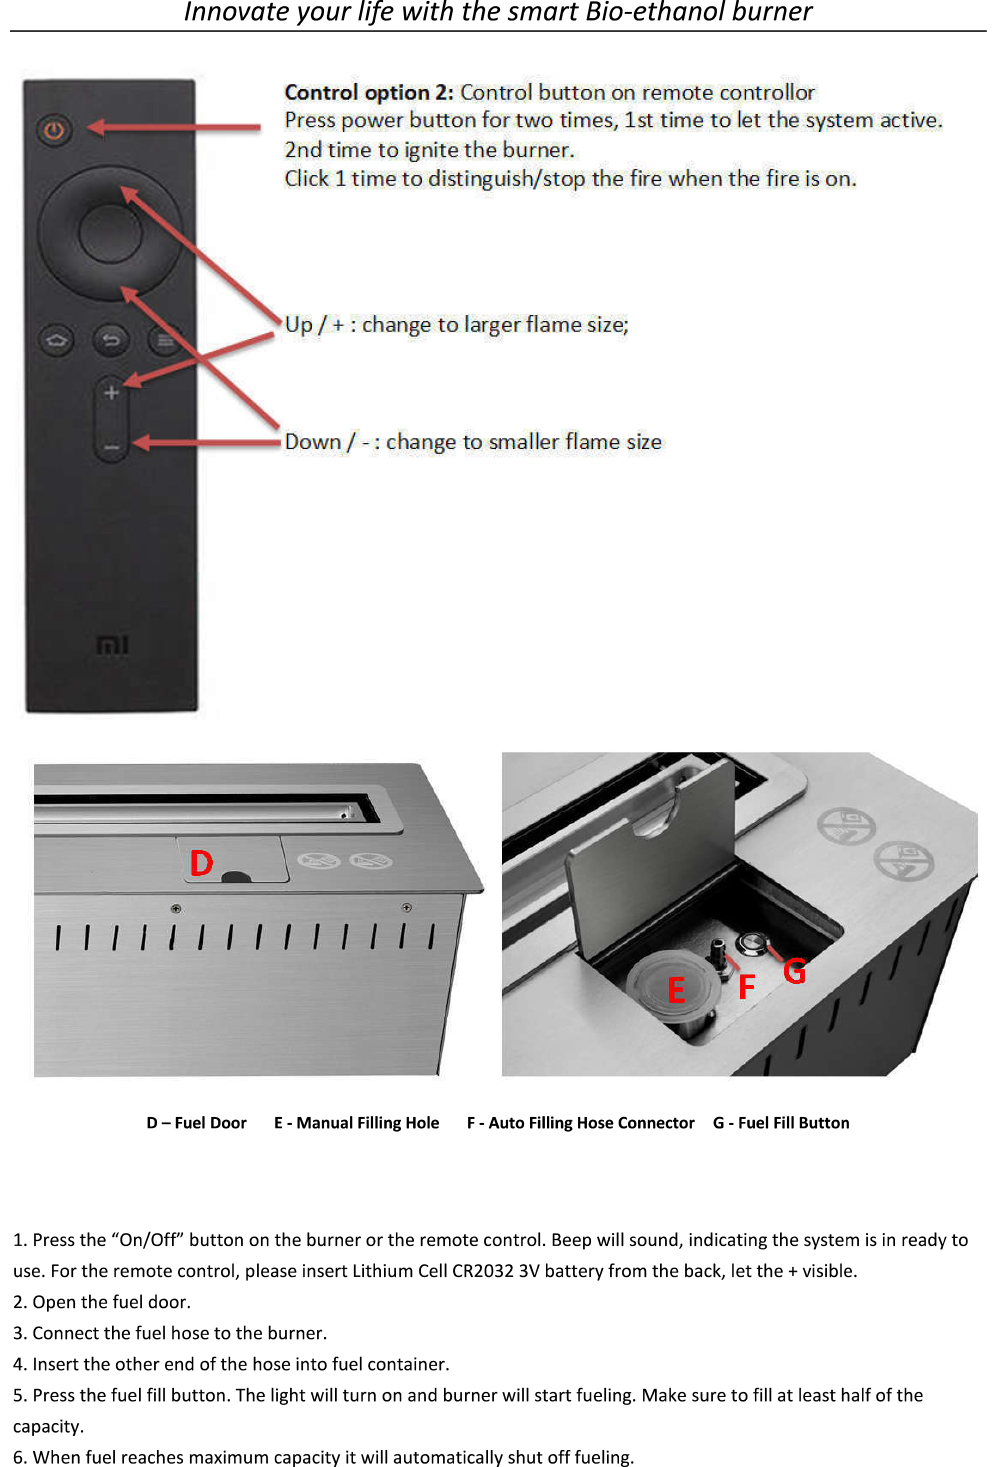 smart fireplace instruction-4